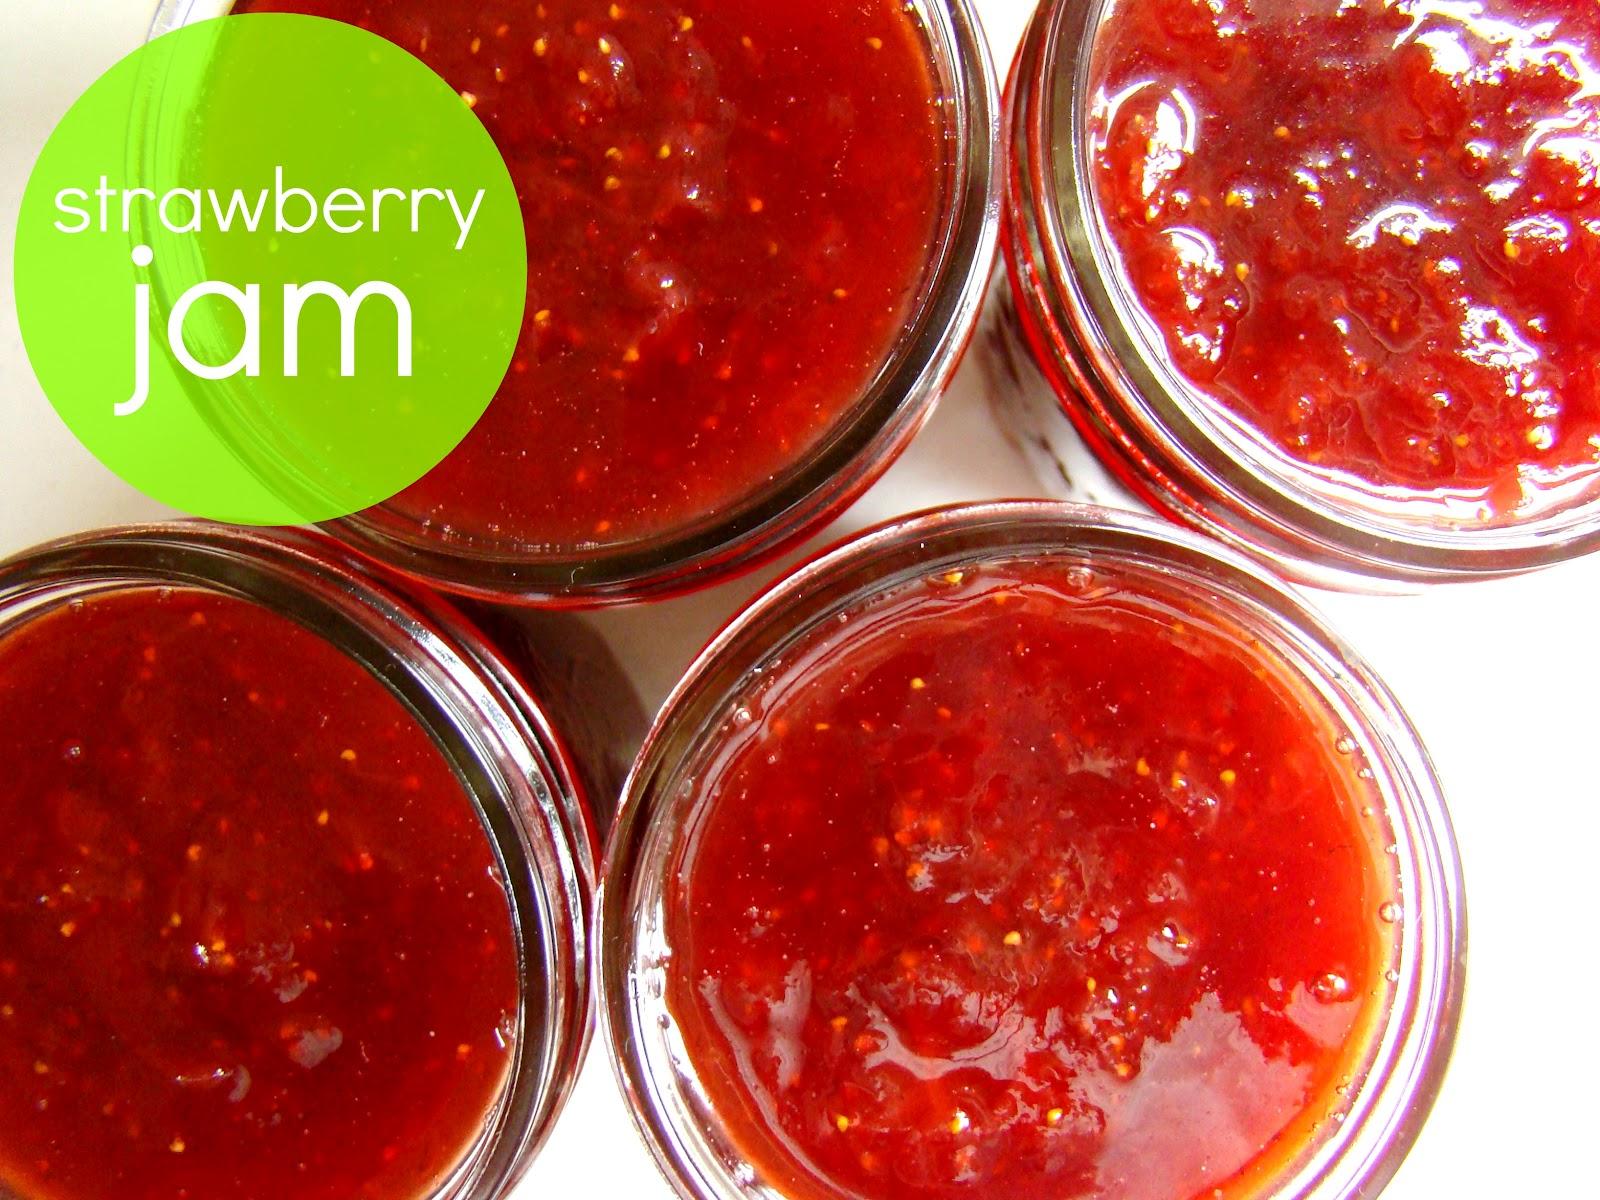 Family Feedbag: Canning - strawberry jam (no added pectin)